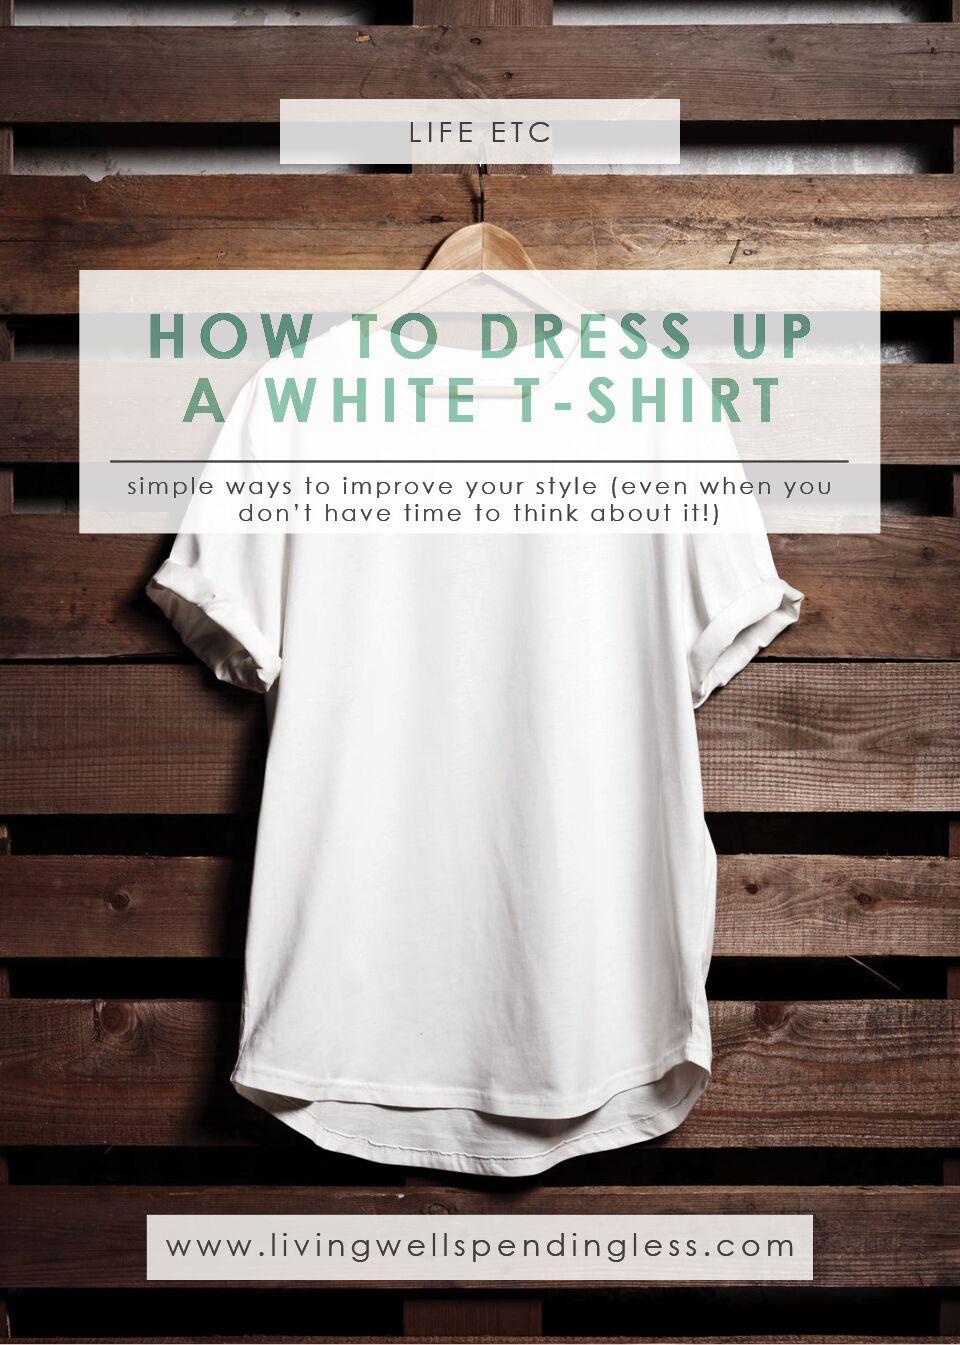 Dress Up a White T-Shirt | Fashion & Beauty | White T-Shirt Outfit Ideas | White T-Shirt Style